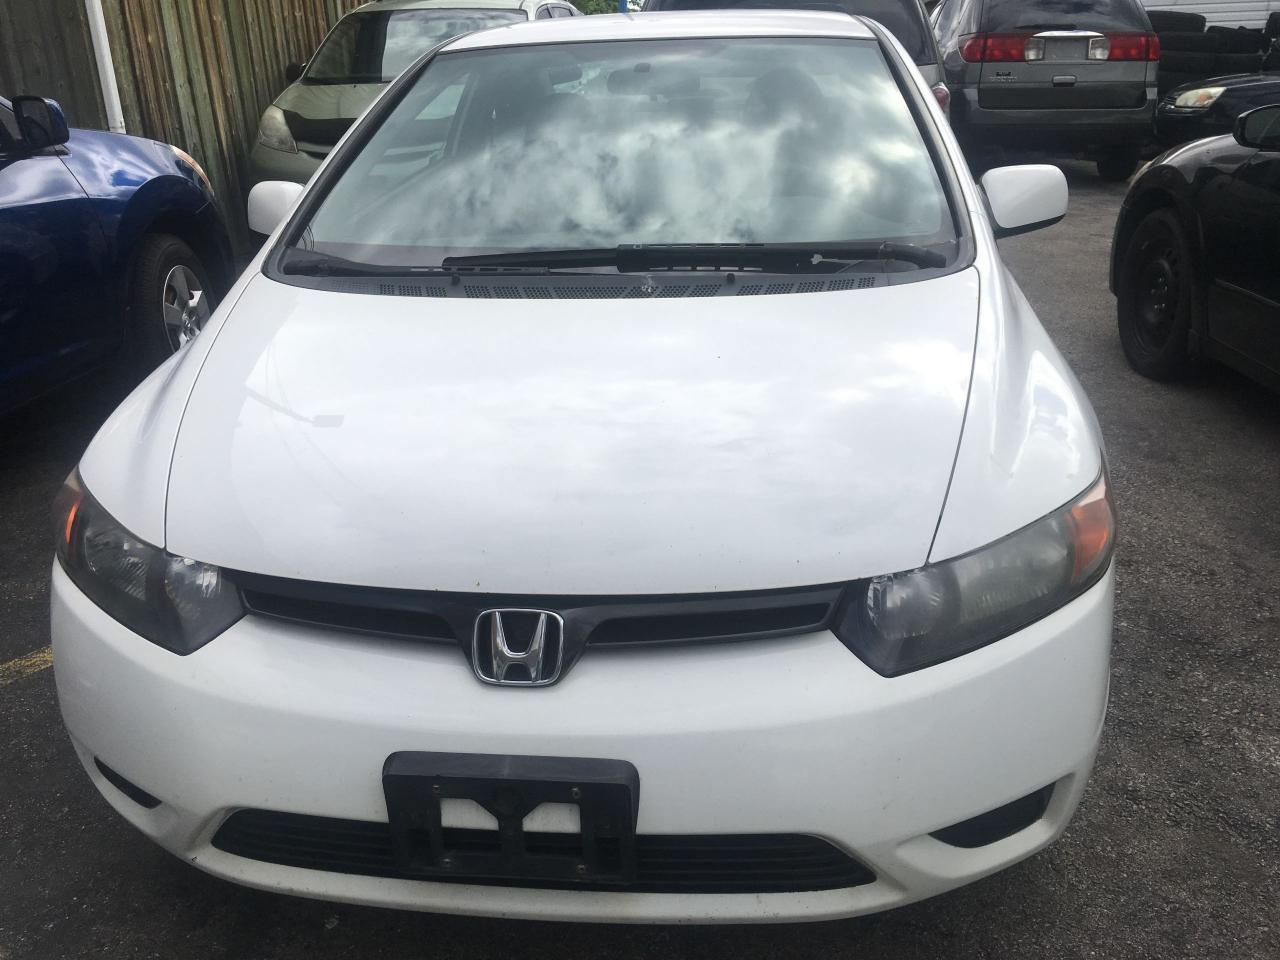 Photo of White 2007 Honda Civic